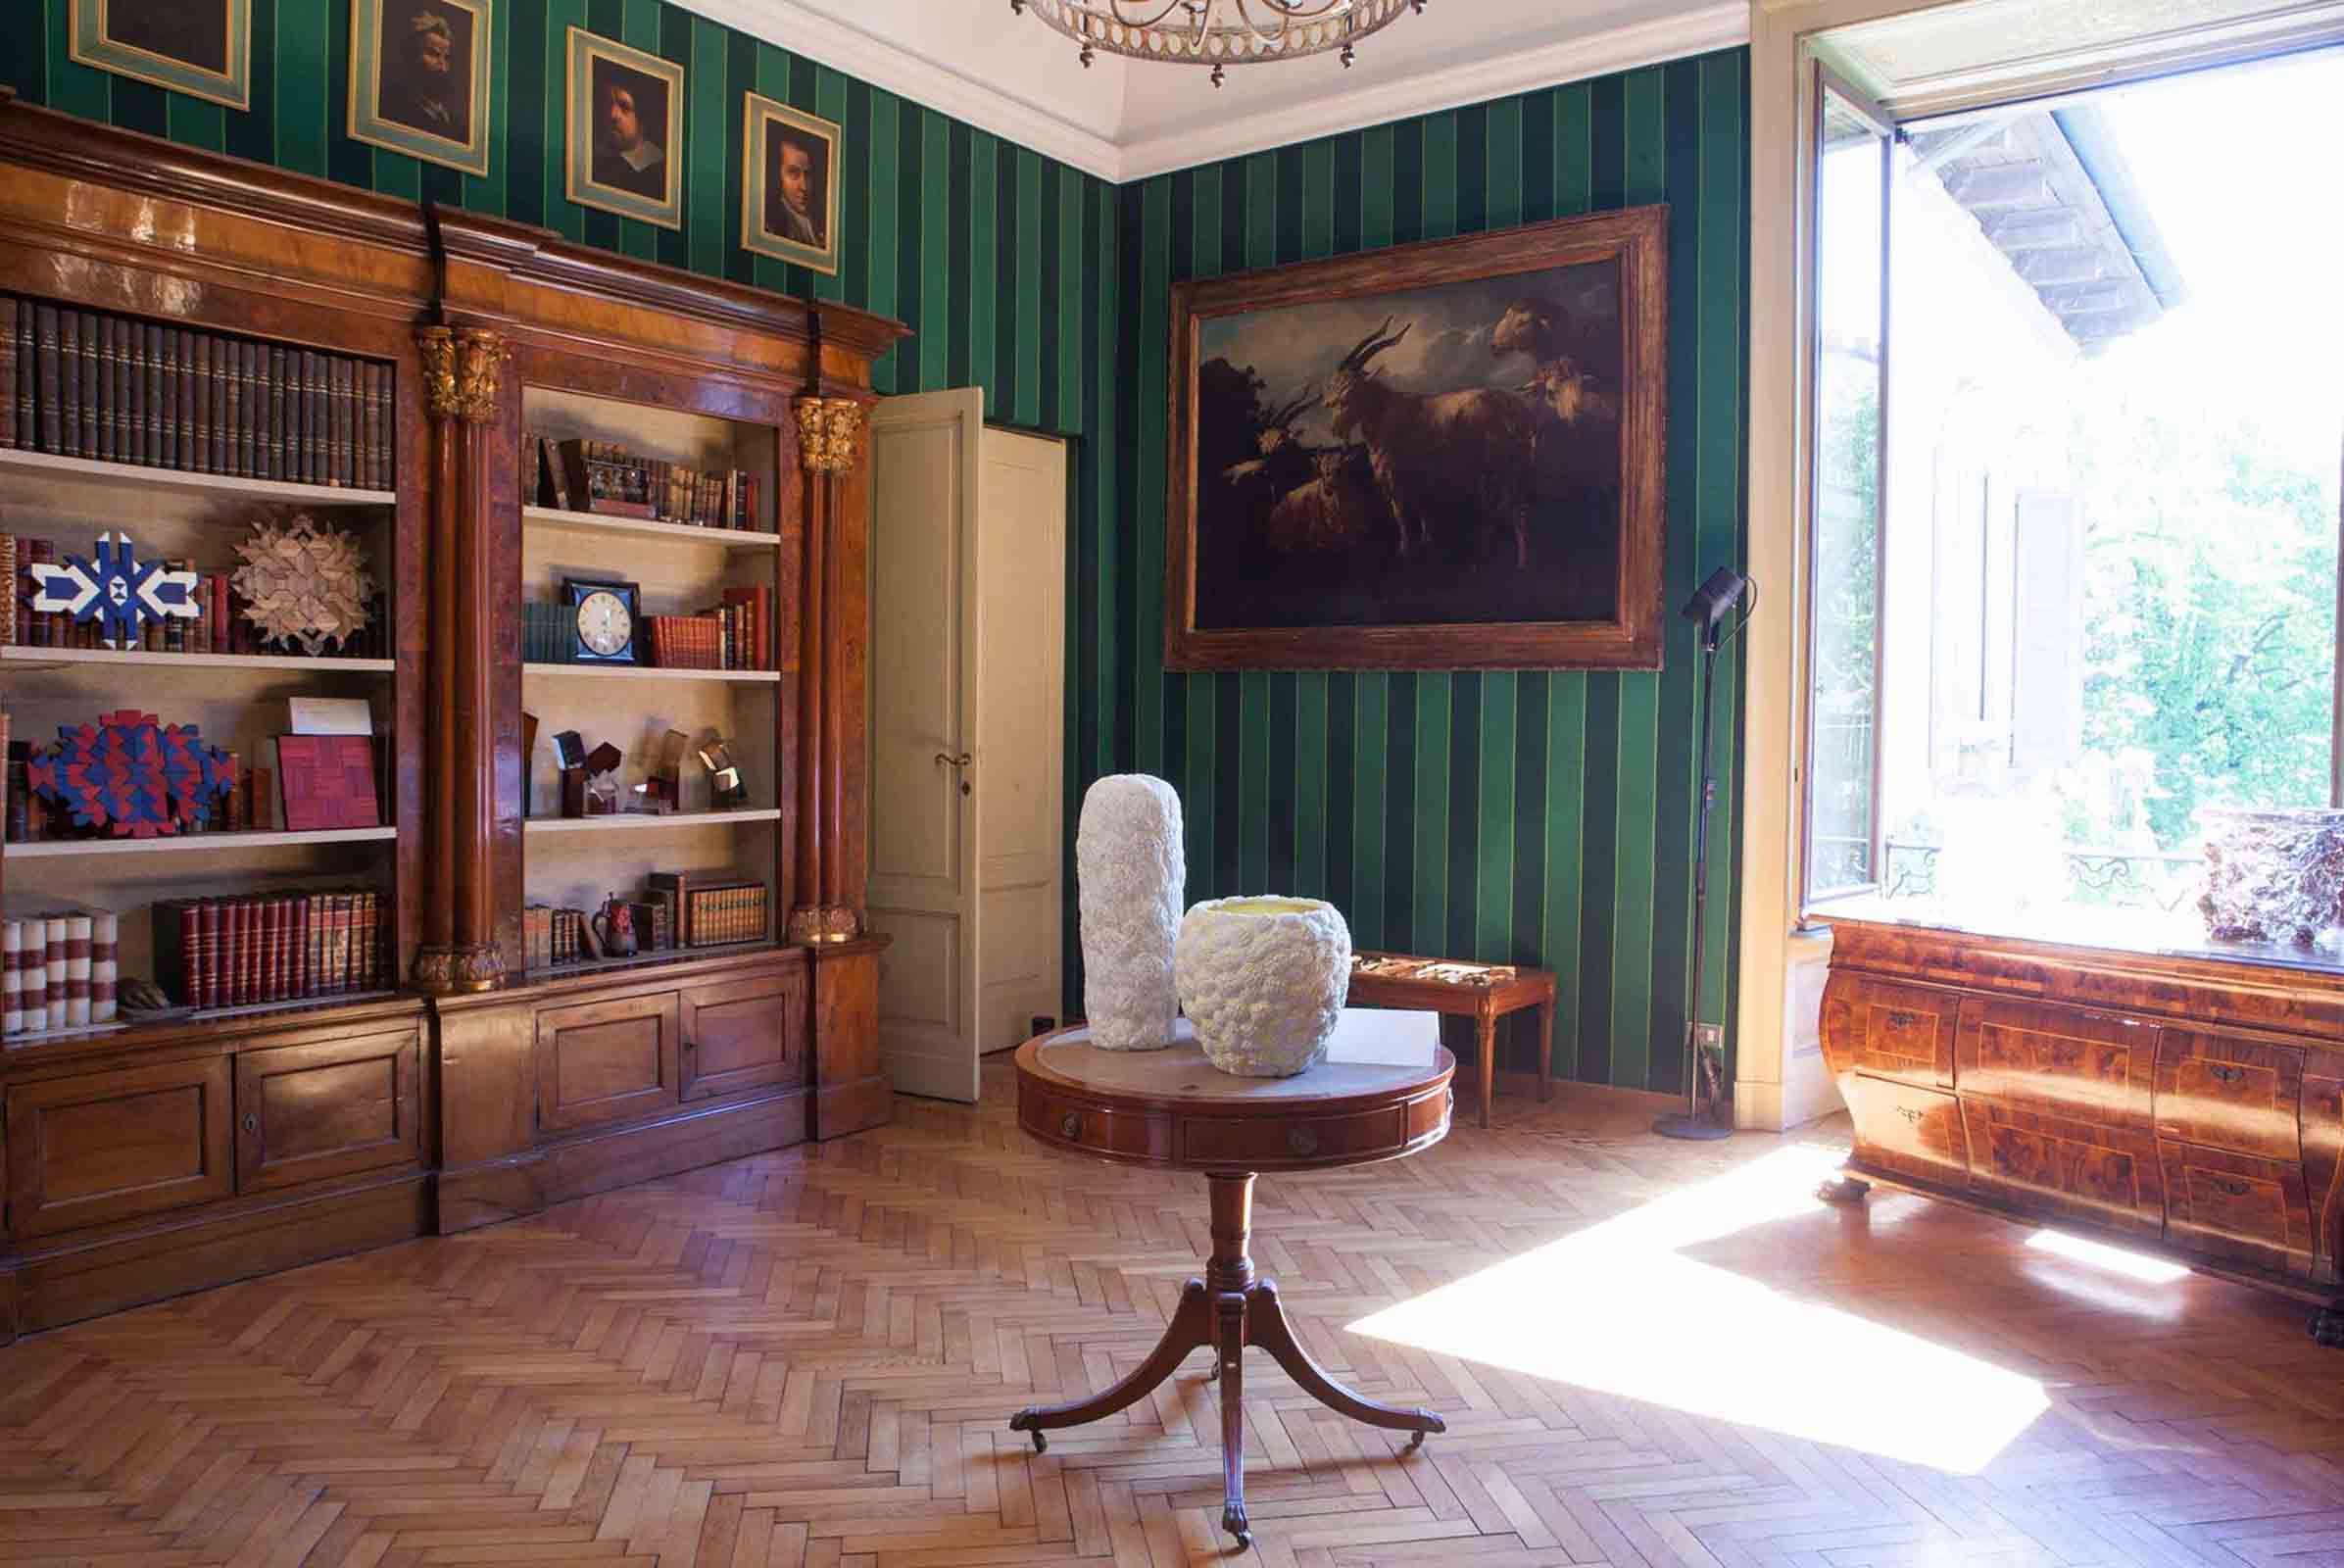 Passeggiata,-An-Airbnb-Experiene-of-Milan,-Marcantonio,-Hitomi.jpg